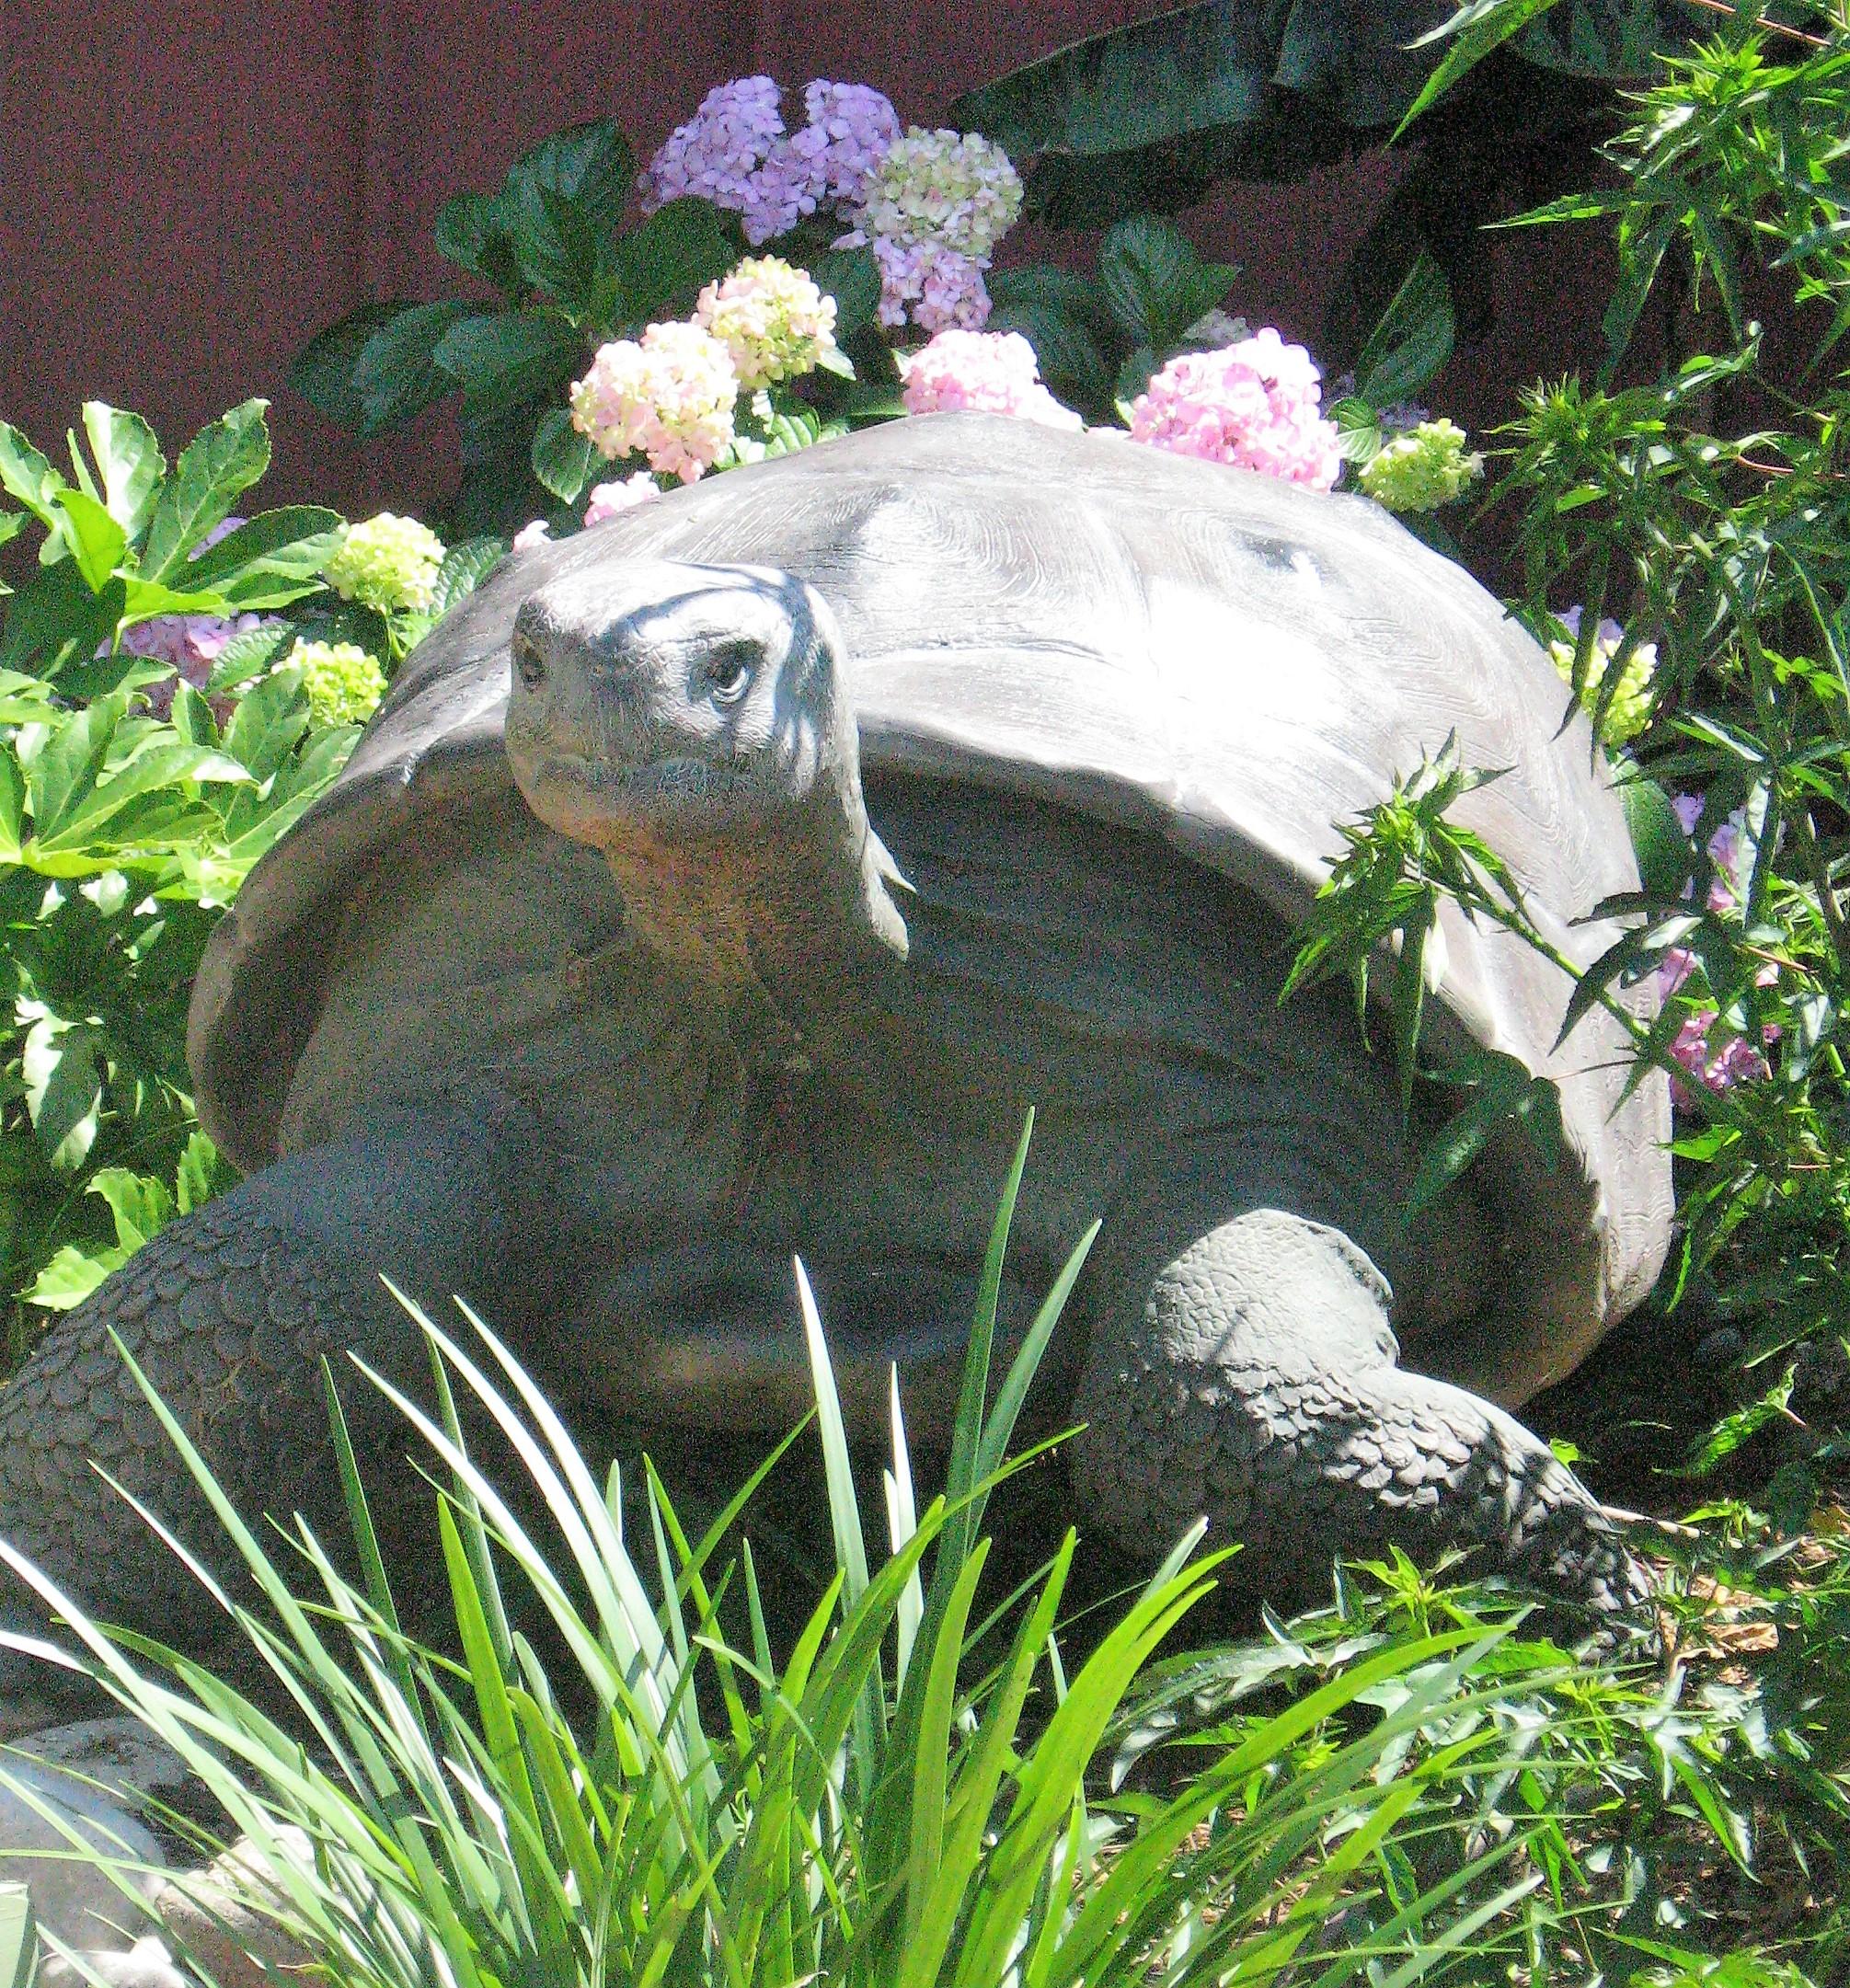 Turtleclose